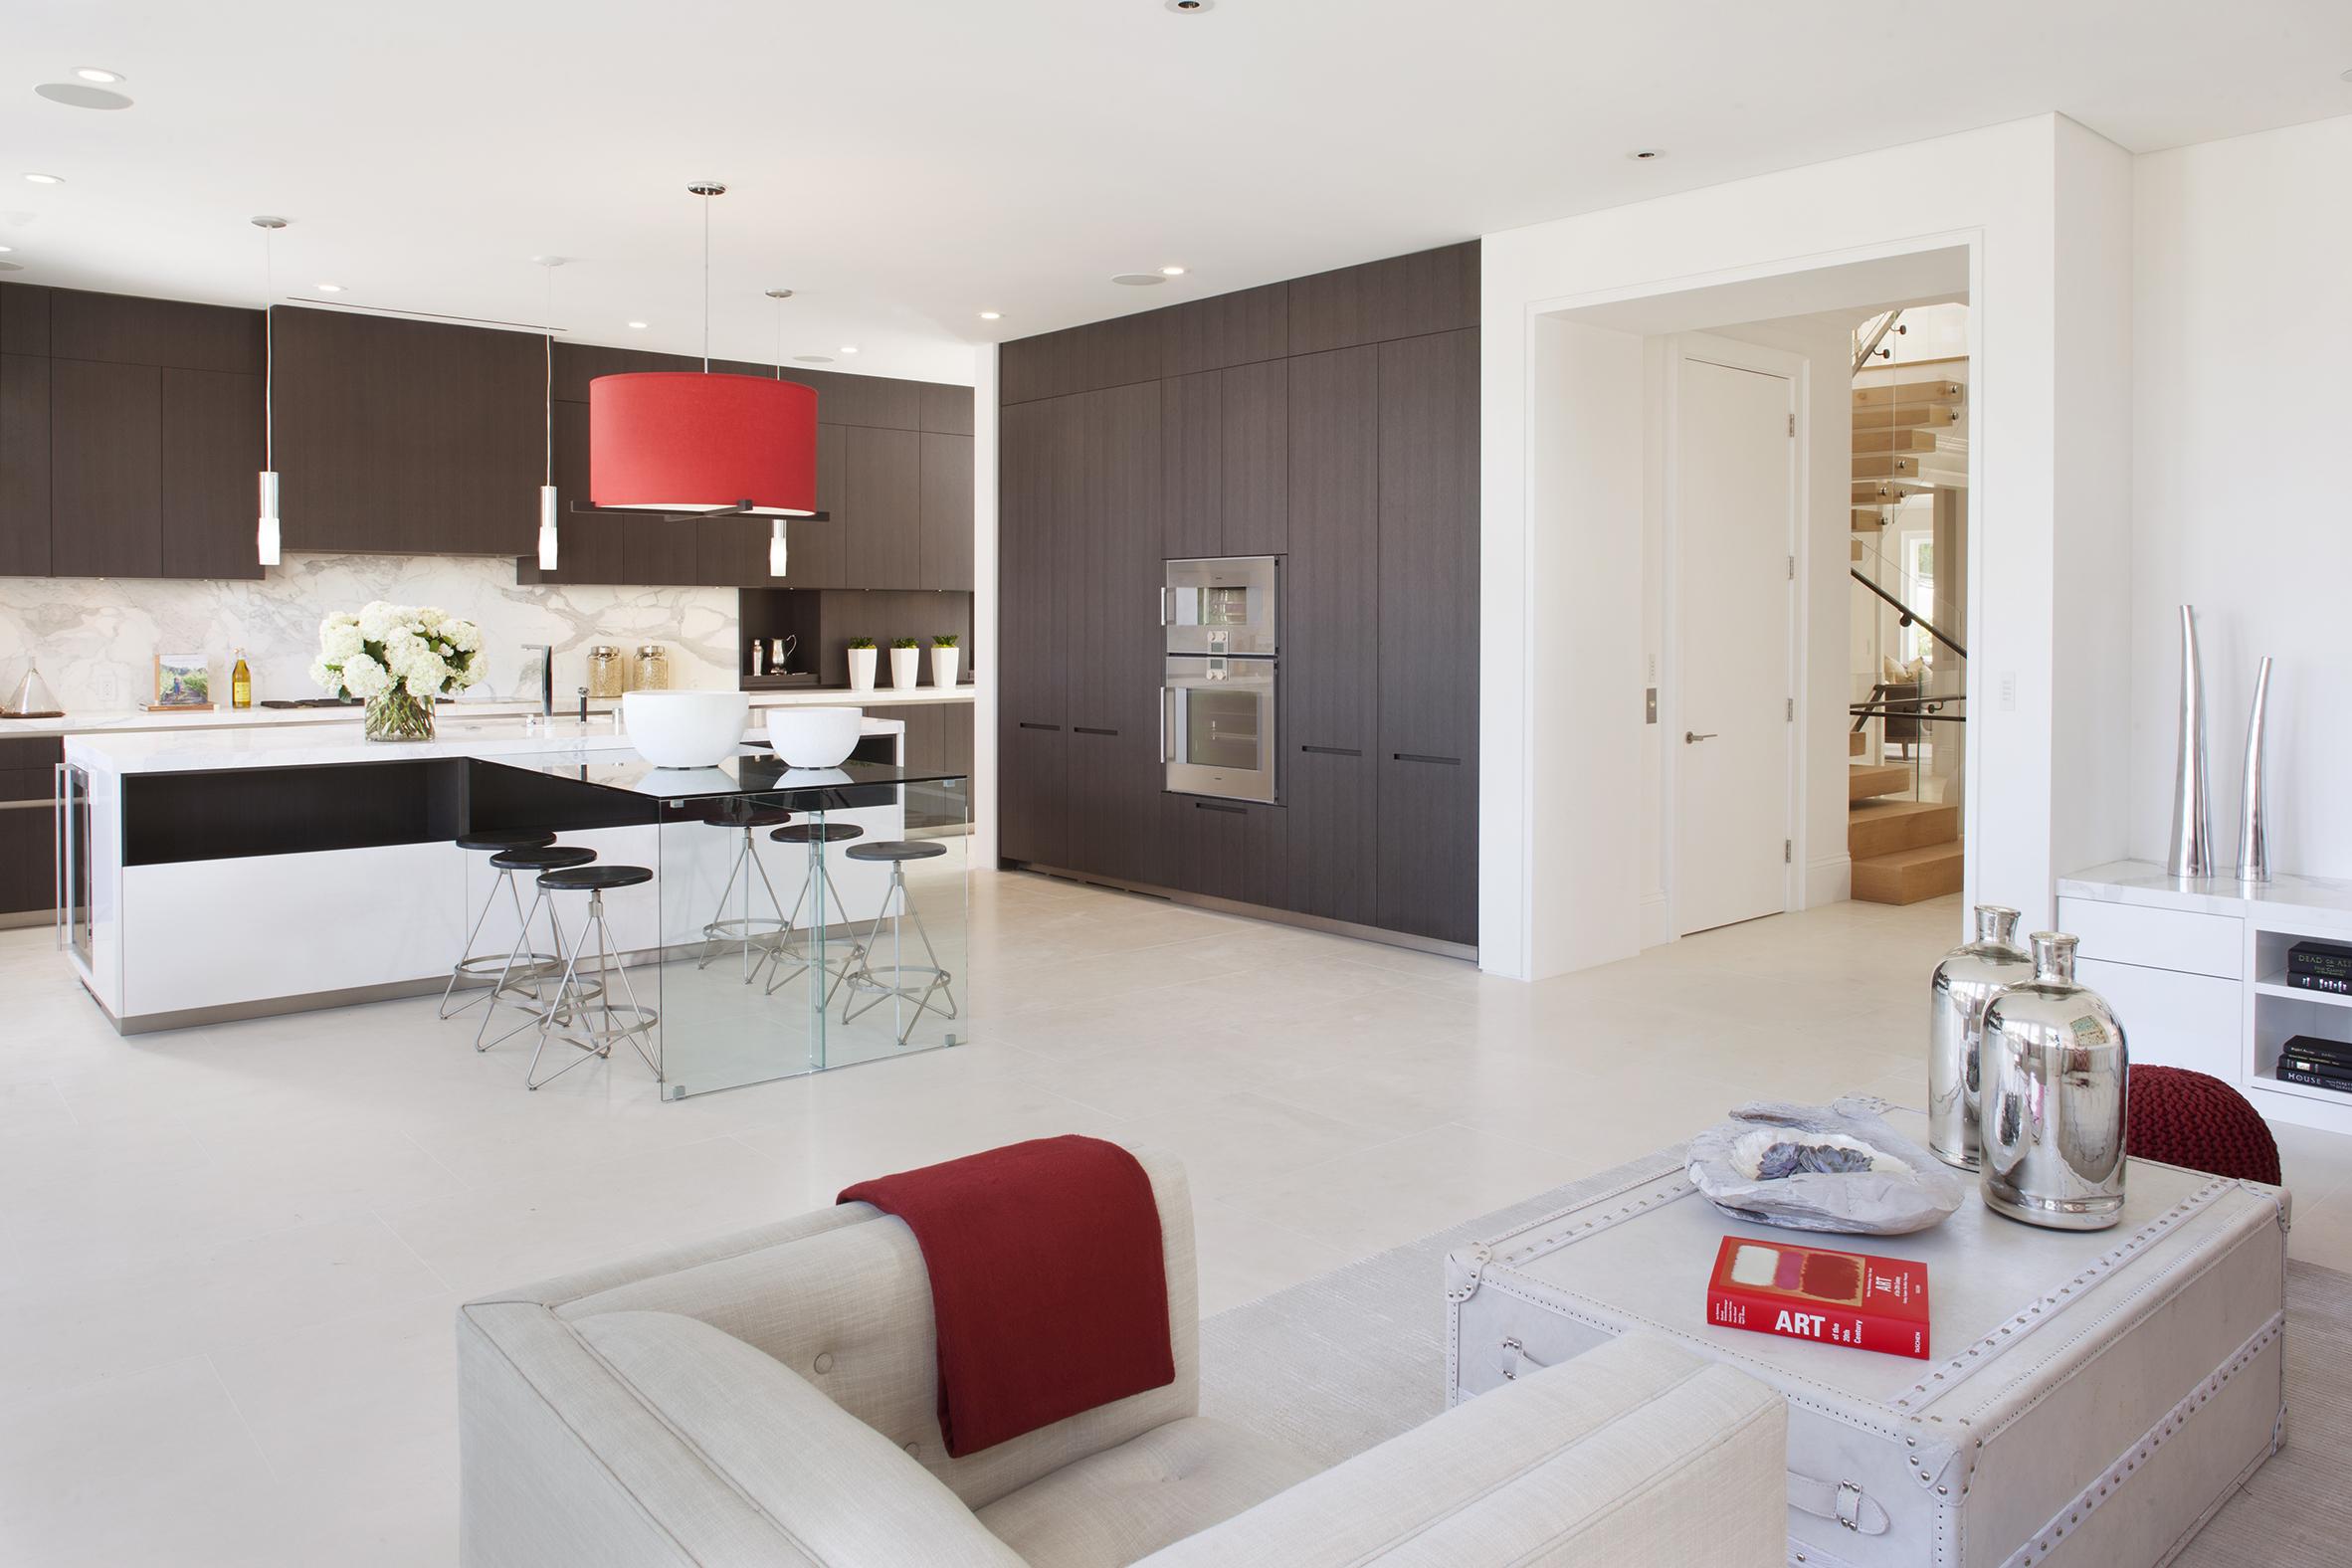 Residence 2750 open kitchen